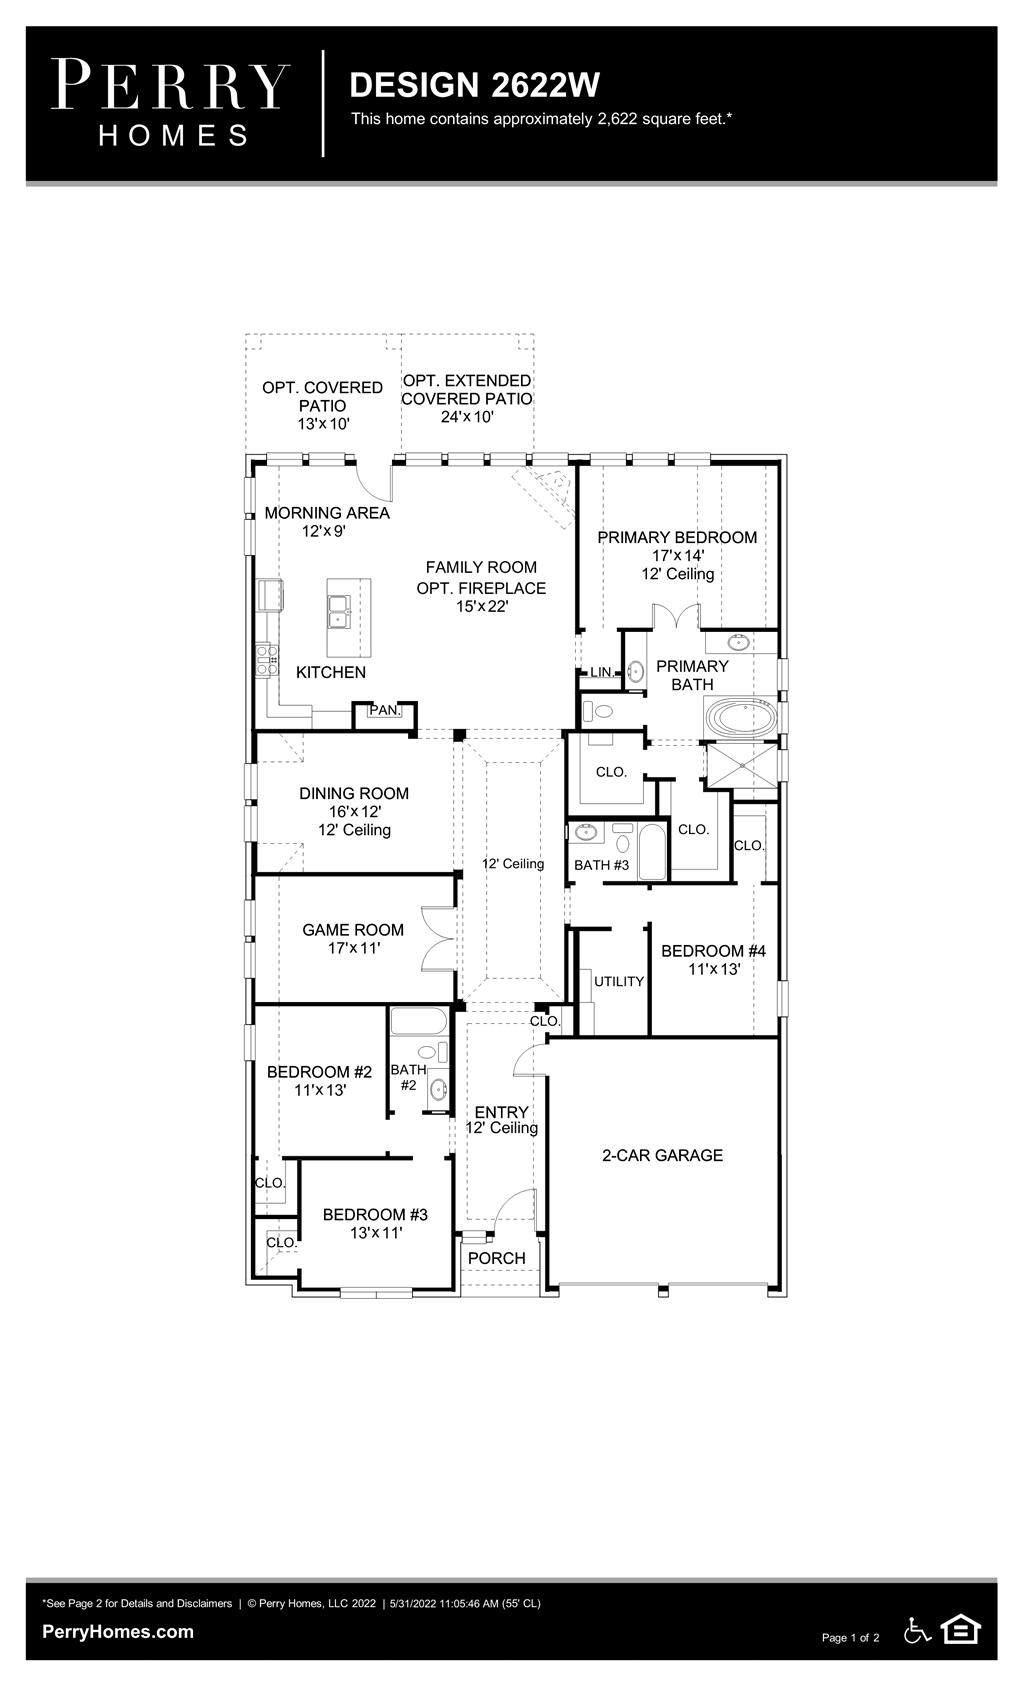 Floor Plan for 2622W